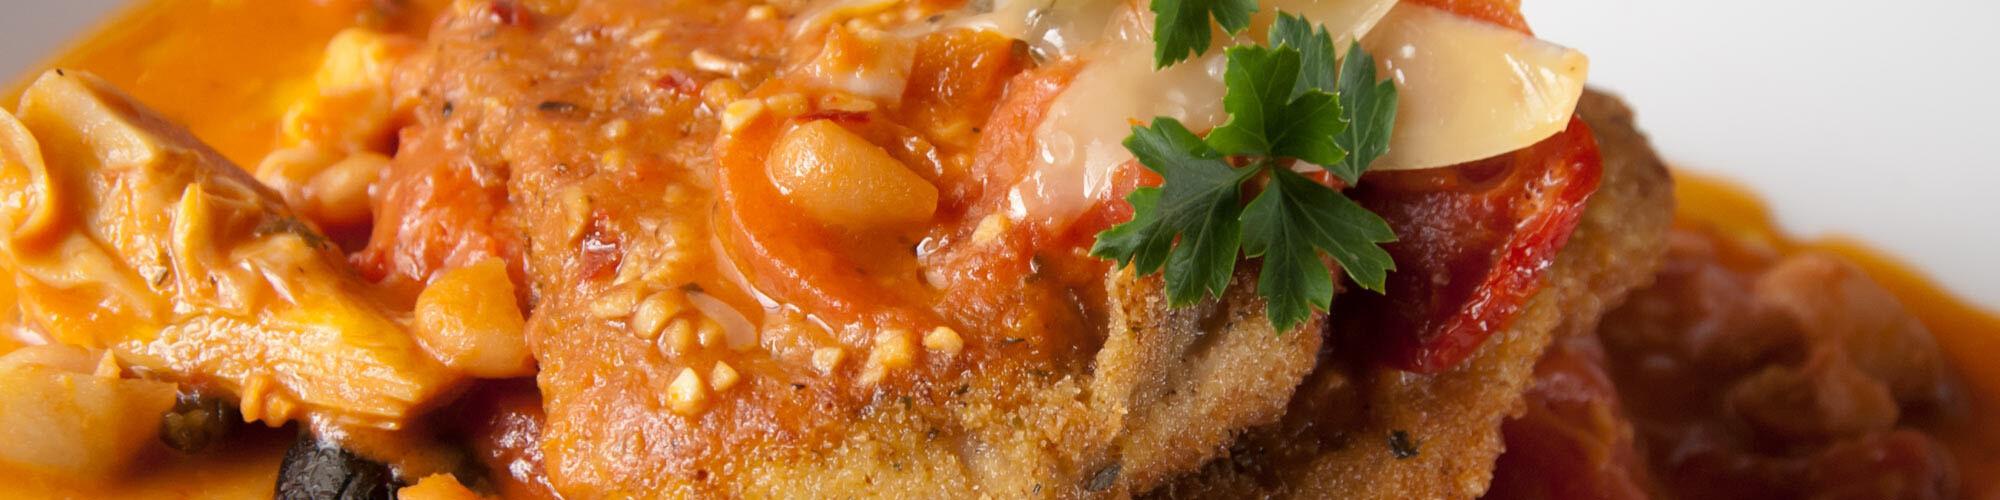 Sicilian Pork Milanese Recipe